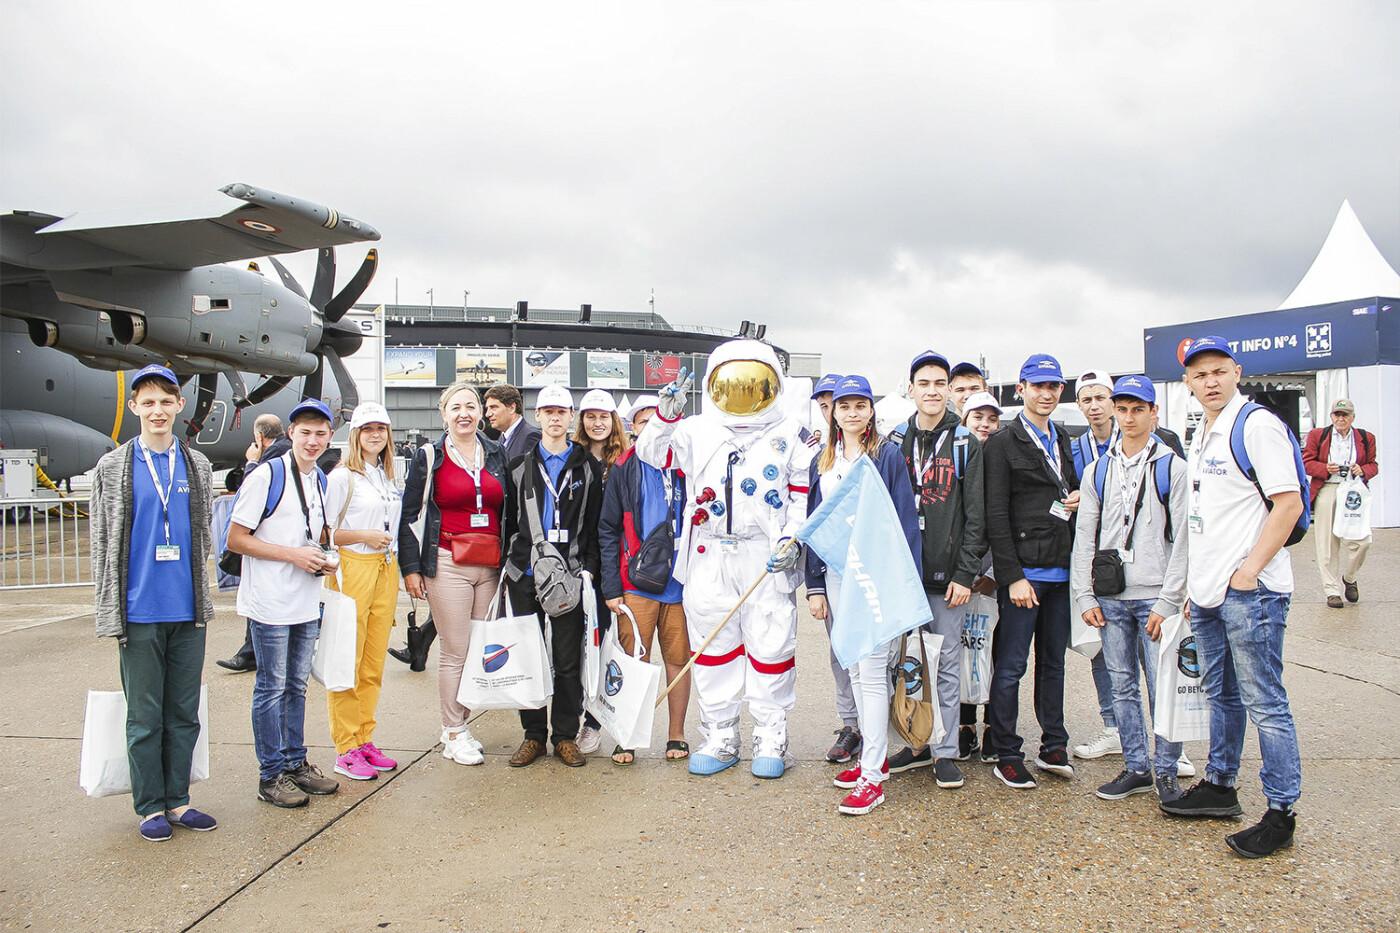 Борис Колесников со школьниками Донбасса посетил крупнейший авиасалон во Франции, фото-4